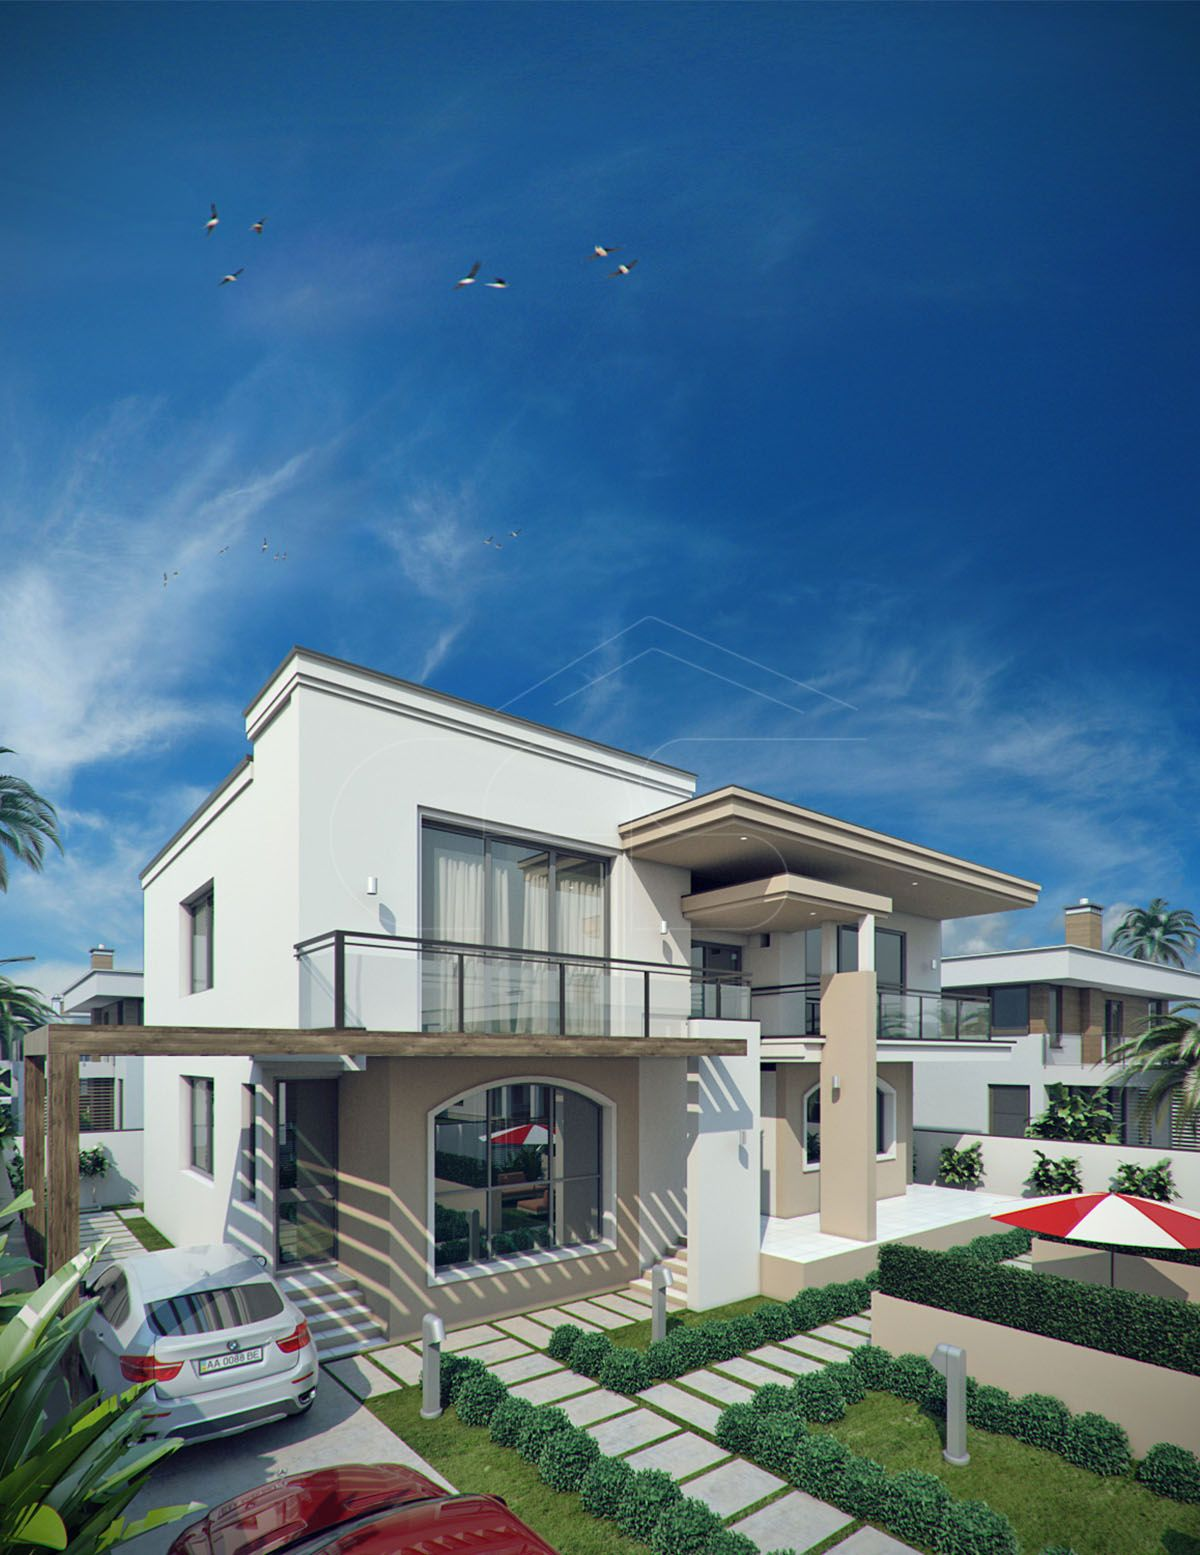 Modern Arabic House Design Basra Cas House Exterior House Structure Design Exterior House Colors